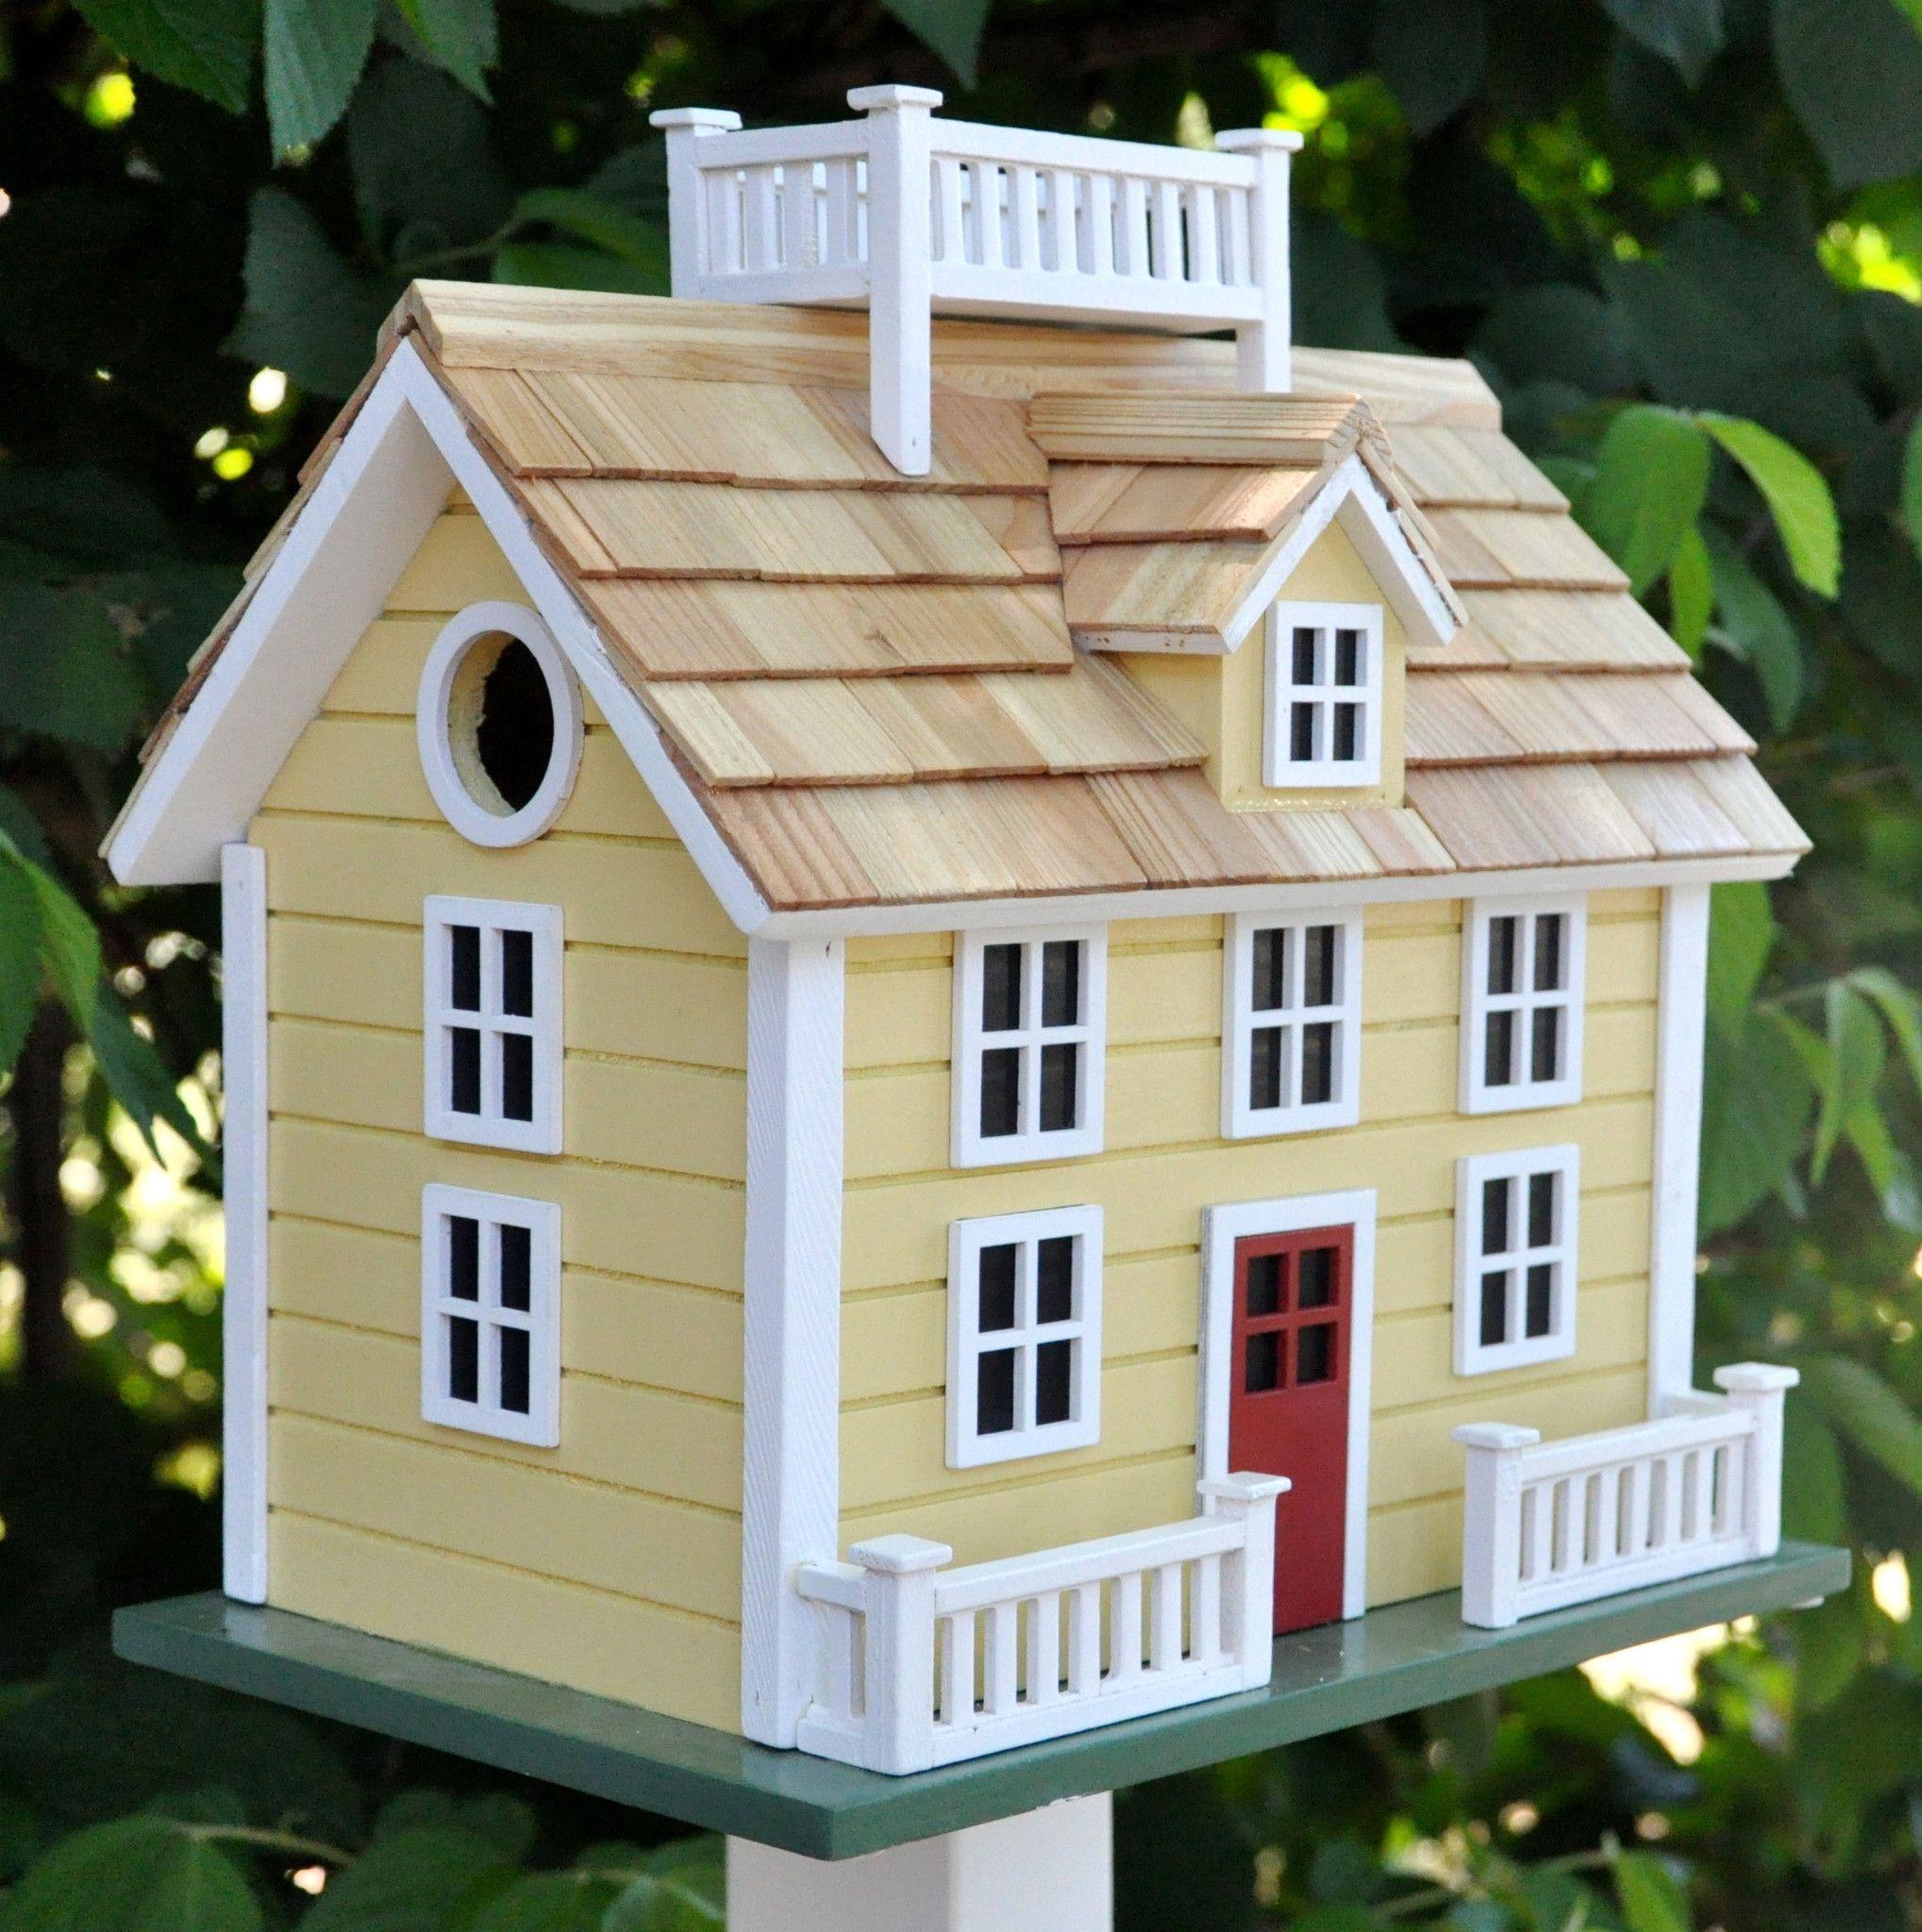 Sconset Cottage Birdhouse Bird houses, Bird house, Bird